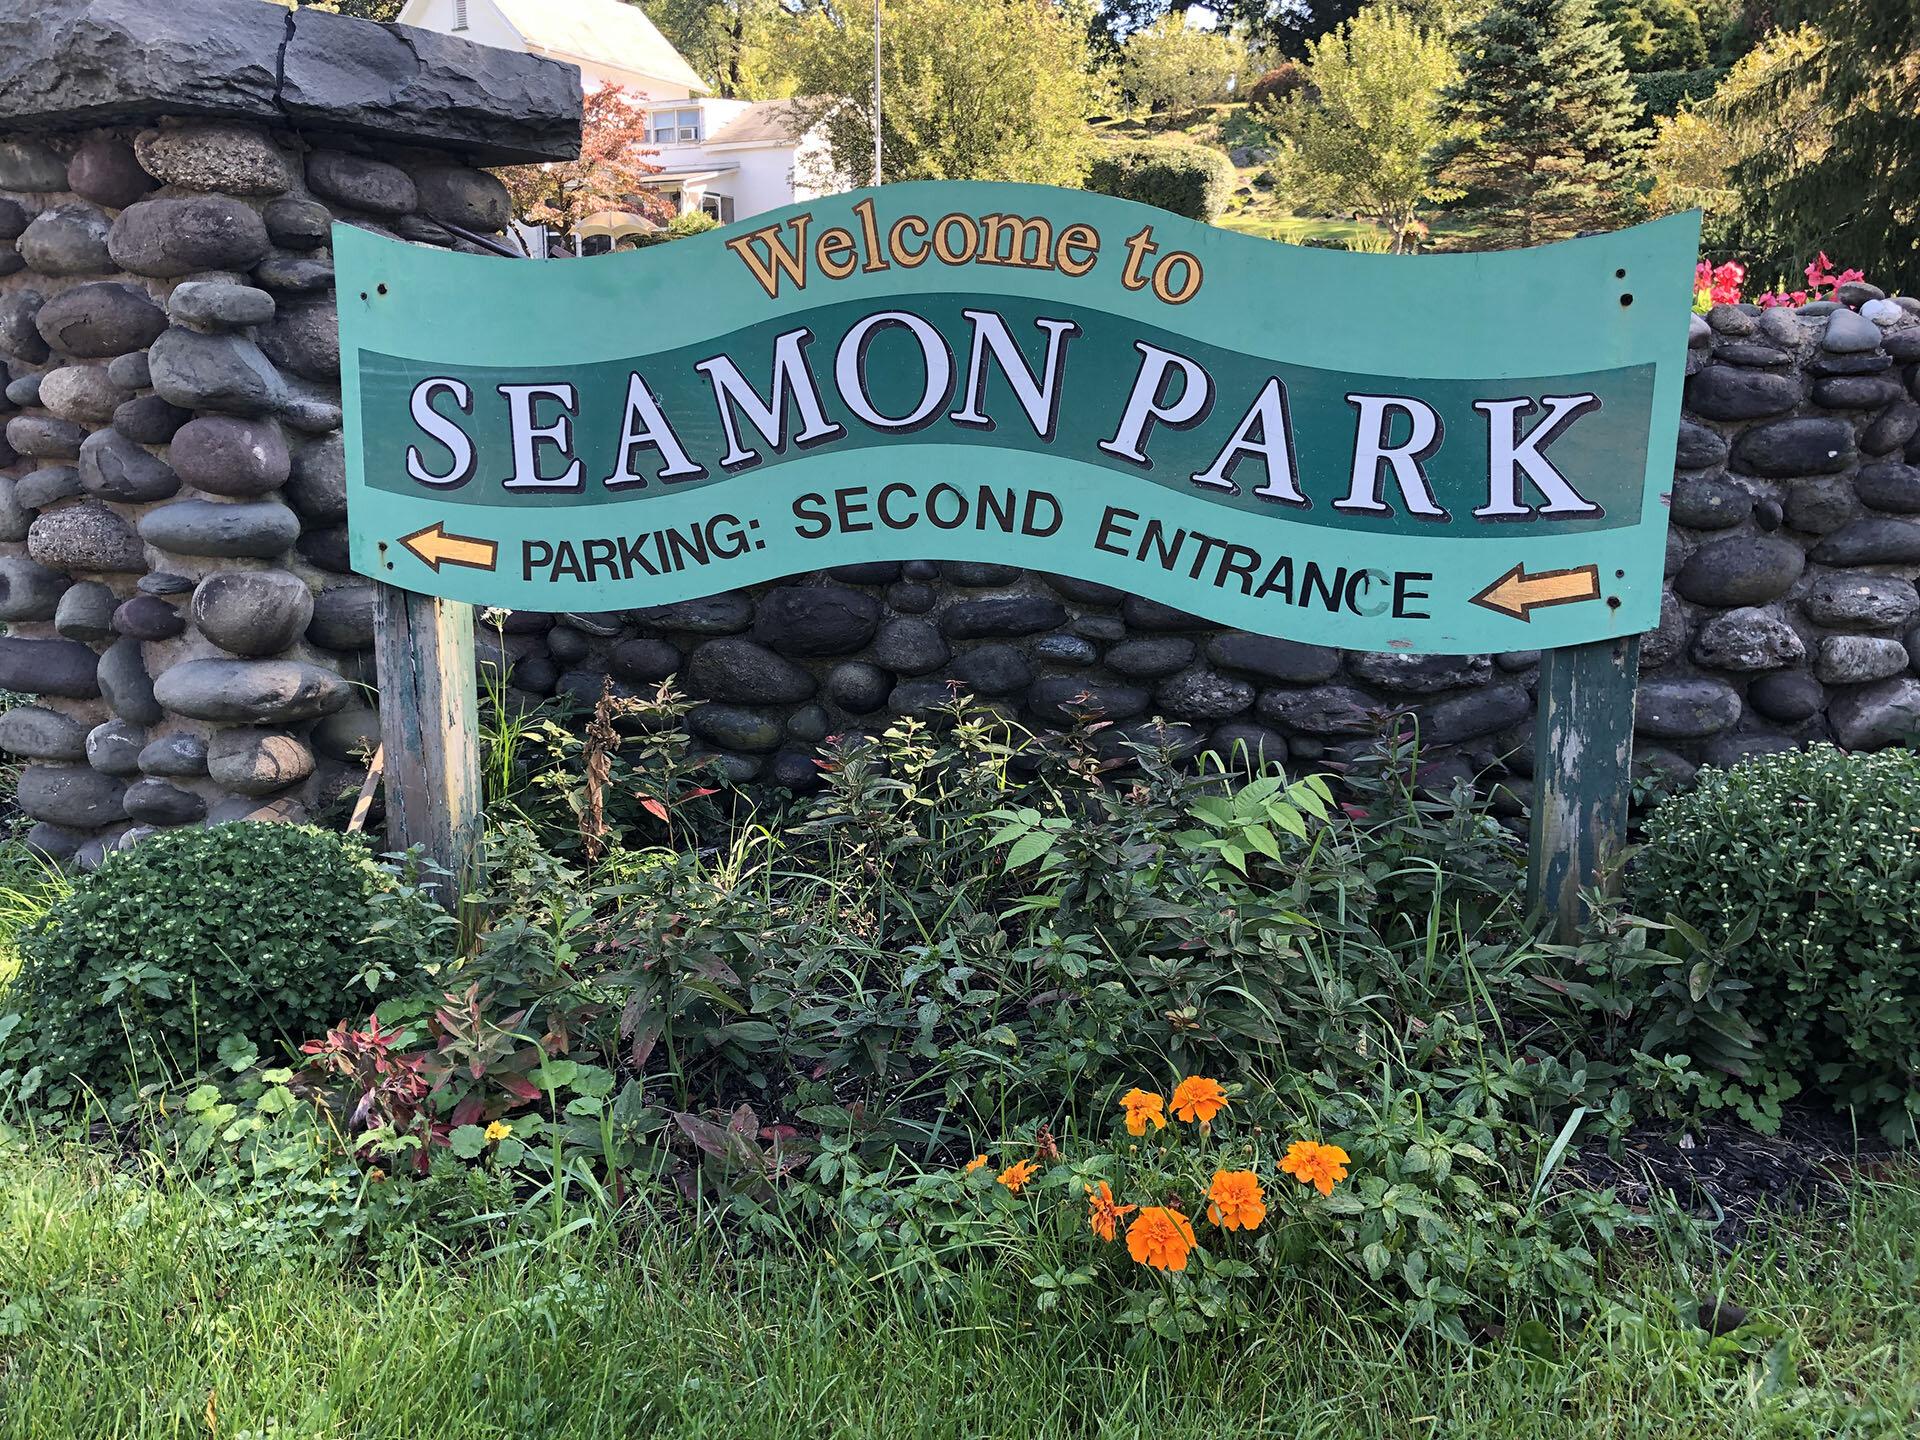 SeamonPark.jpg